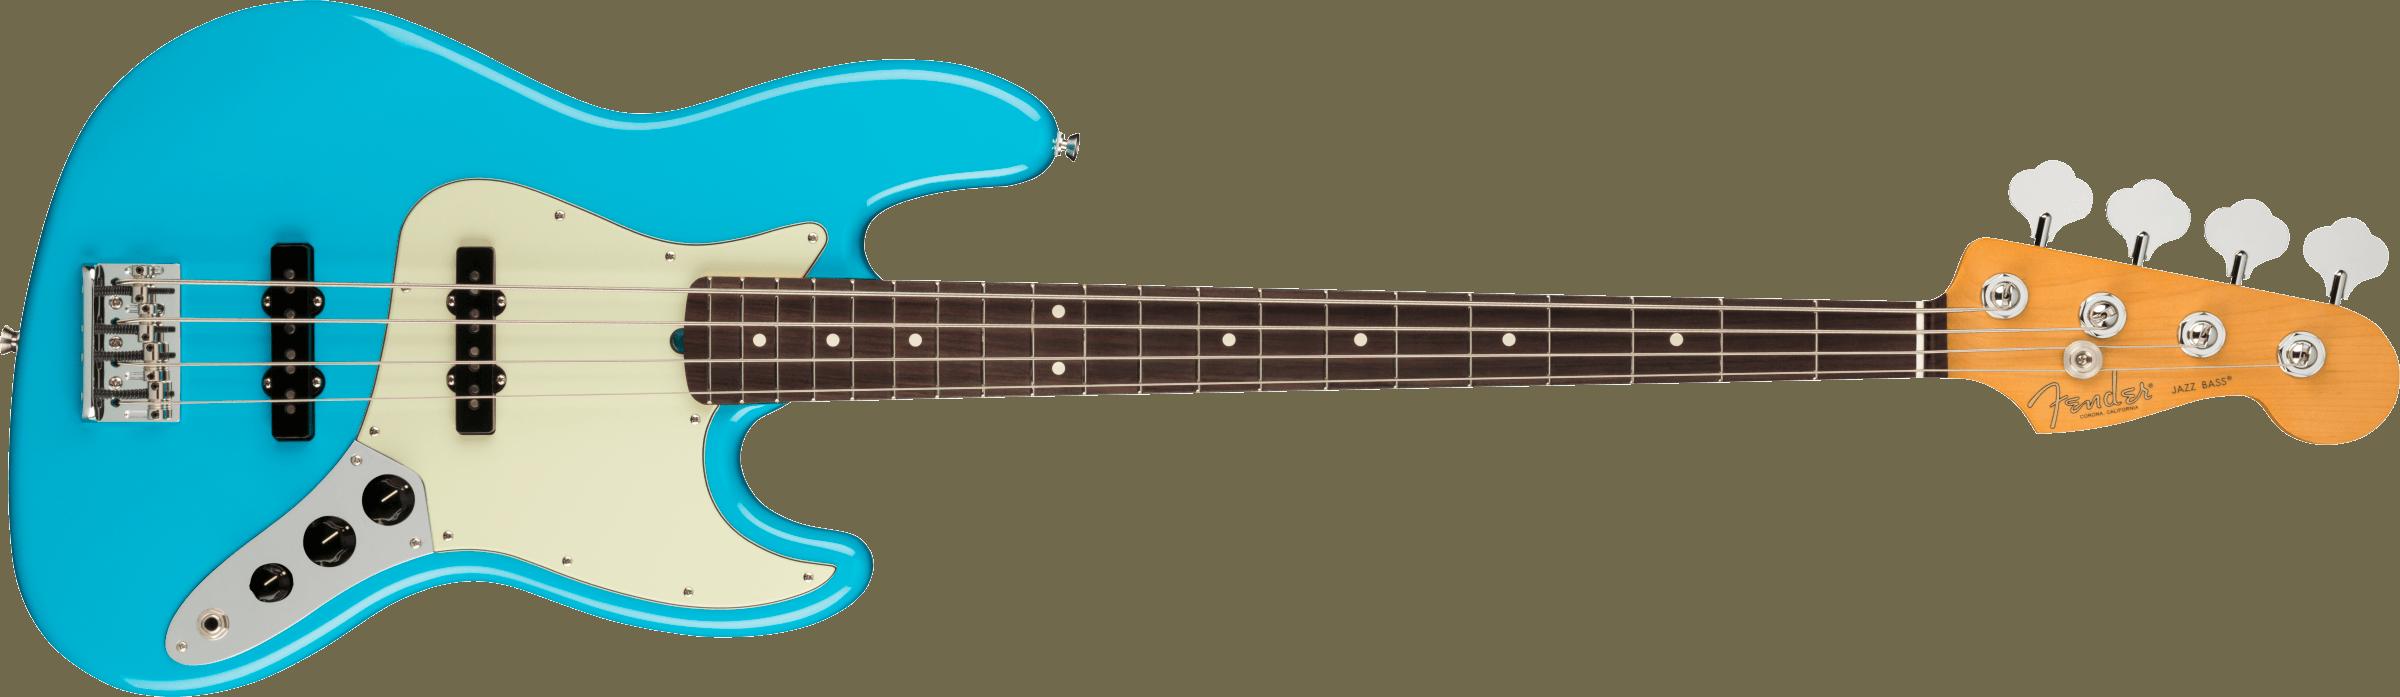 FENDER-American-Professional-II-Jazz-Bass-Rosewood-Fingerboard-Miami-Blue-sku-571005479